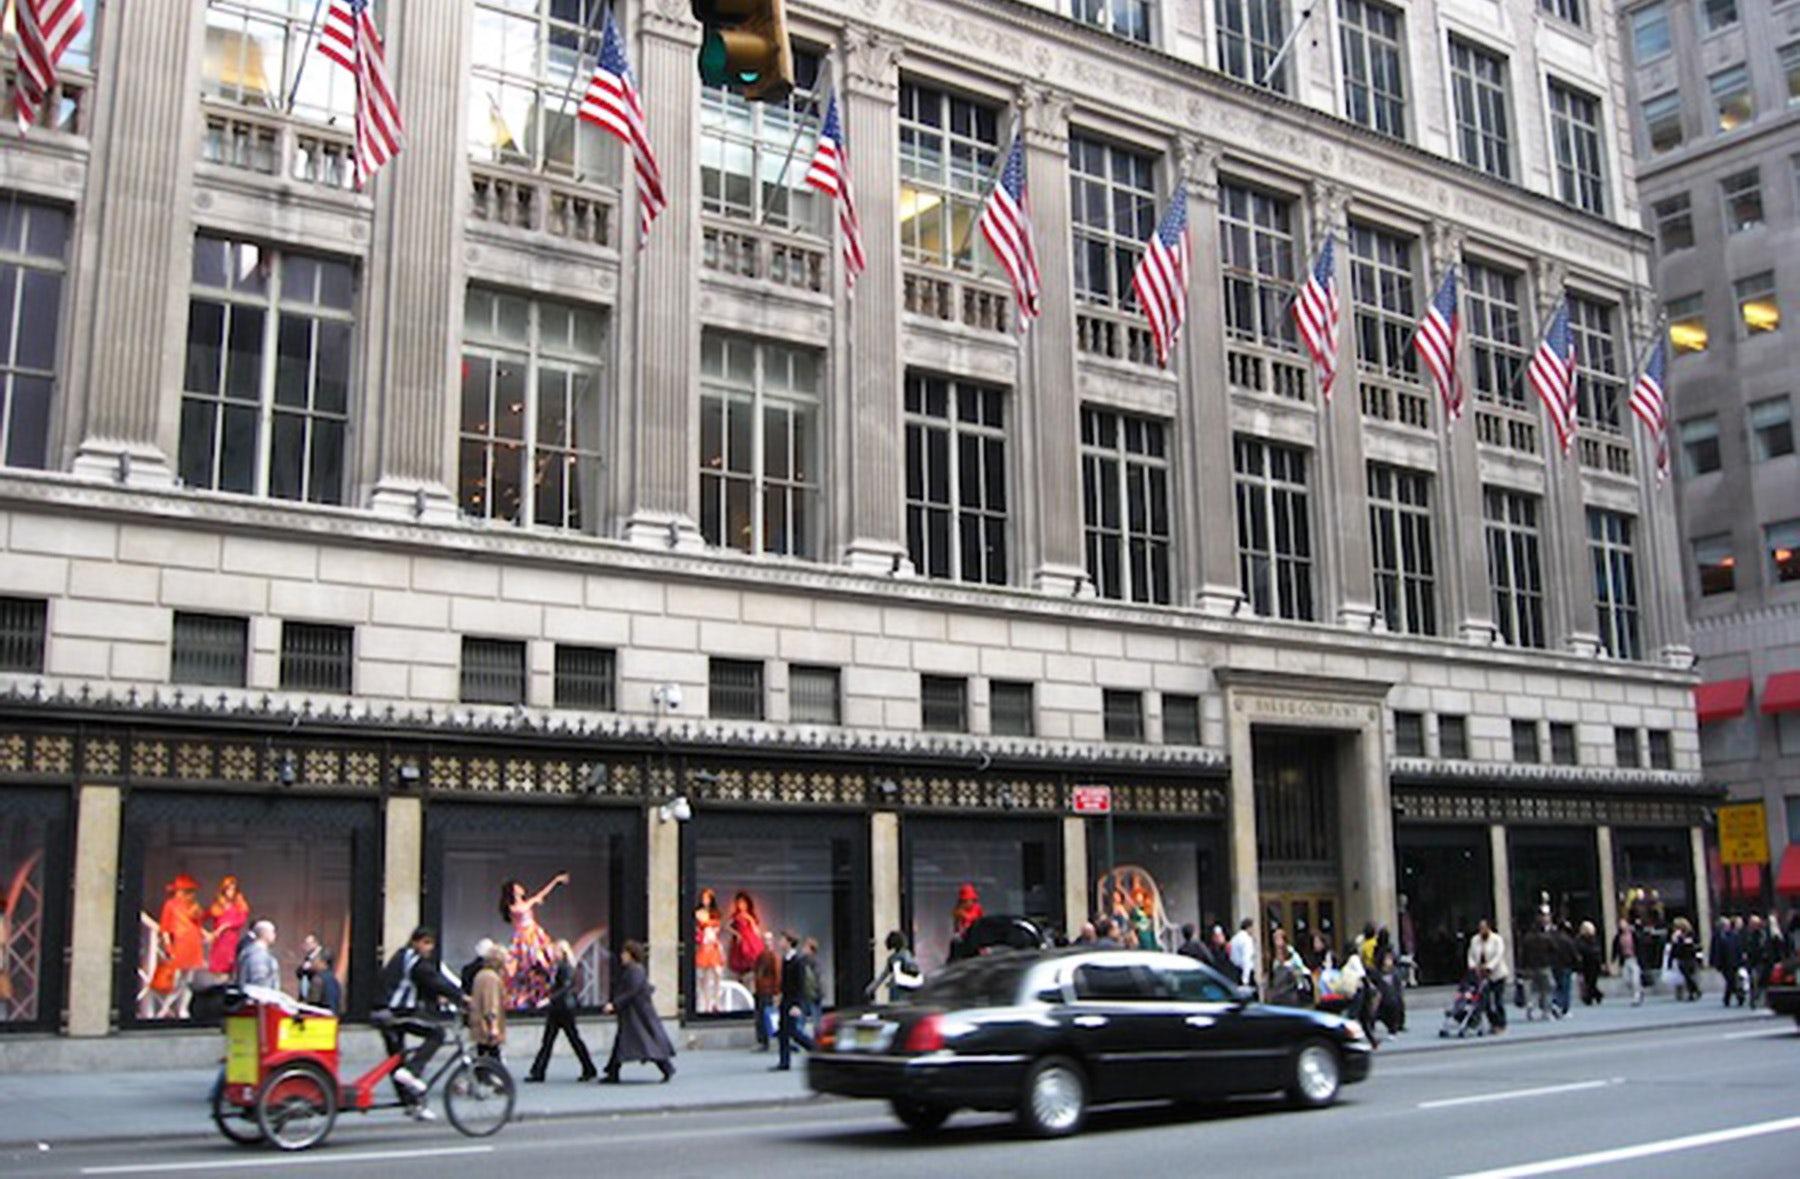 Saks Fifth Avenue, New York | Source: Saks Fifth Avenue